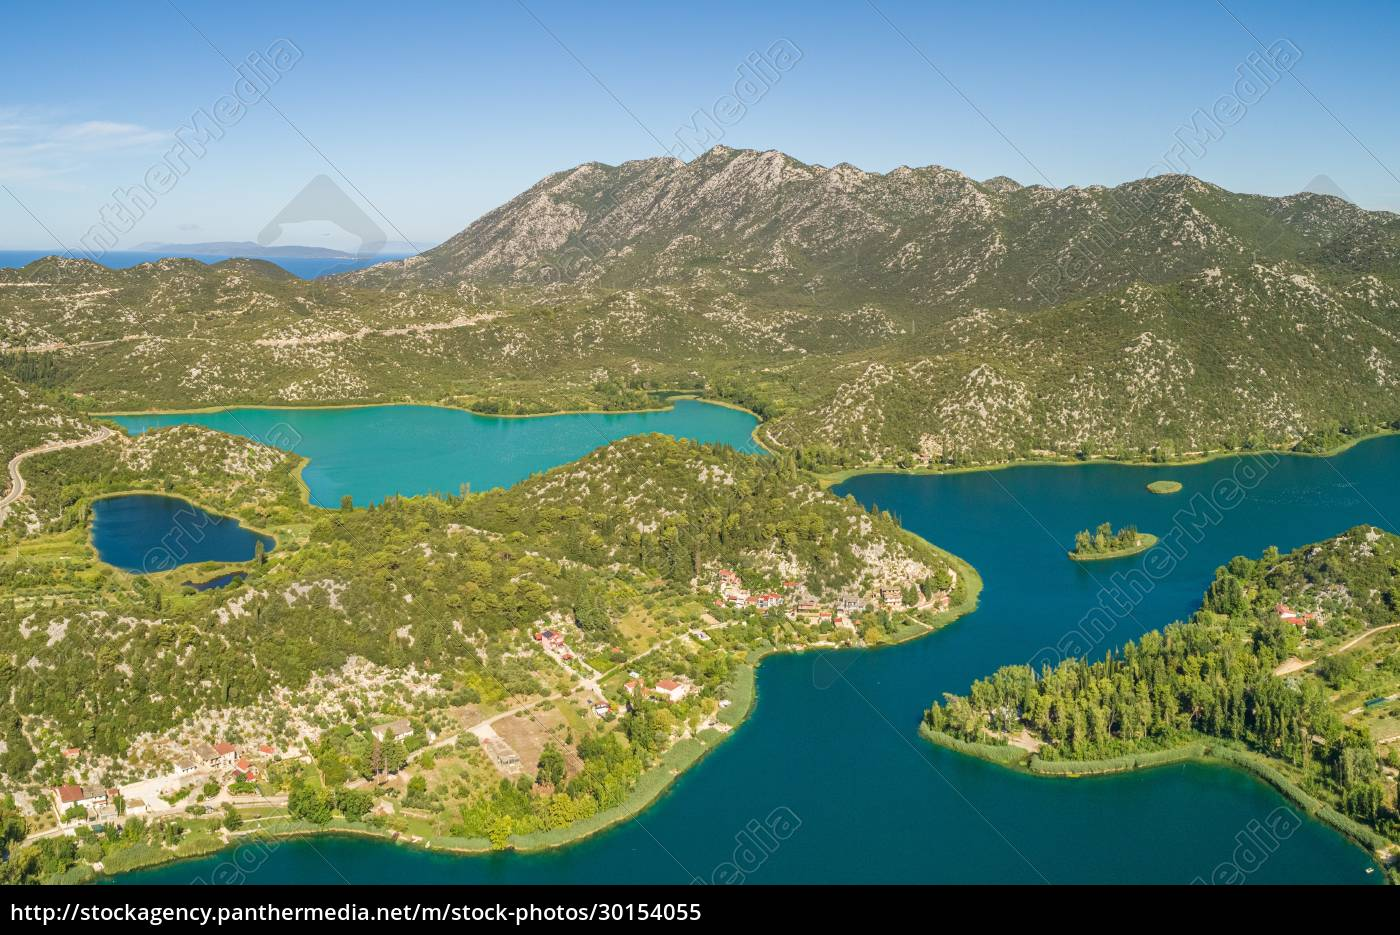 aerial, view, of, bacina, fresh, water - 30154055